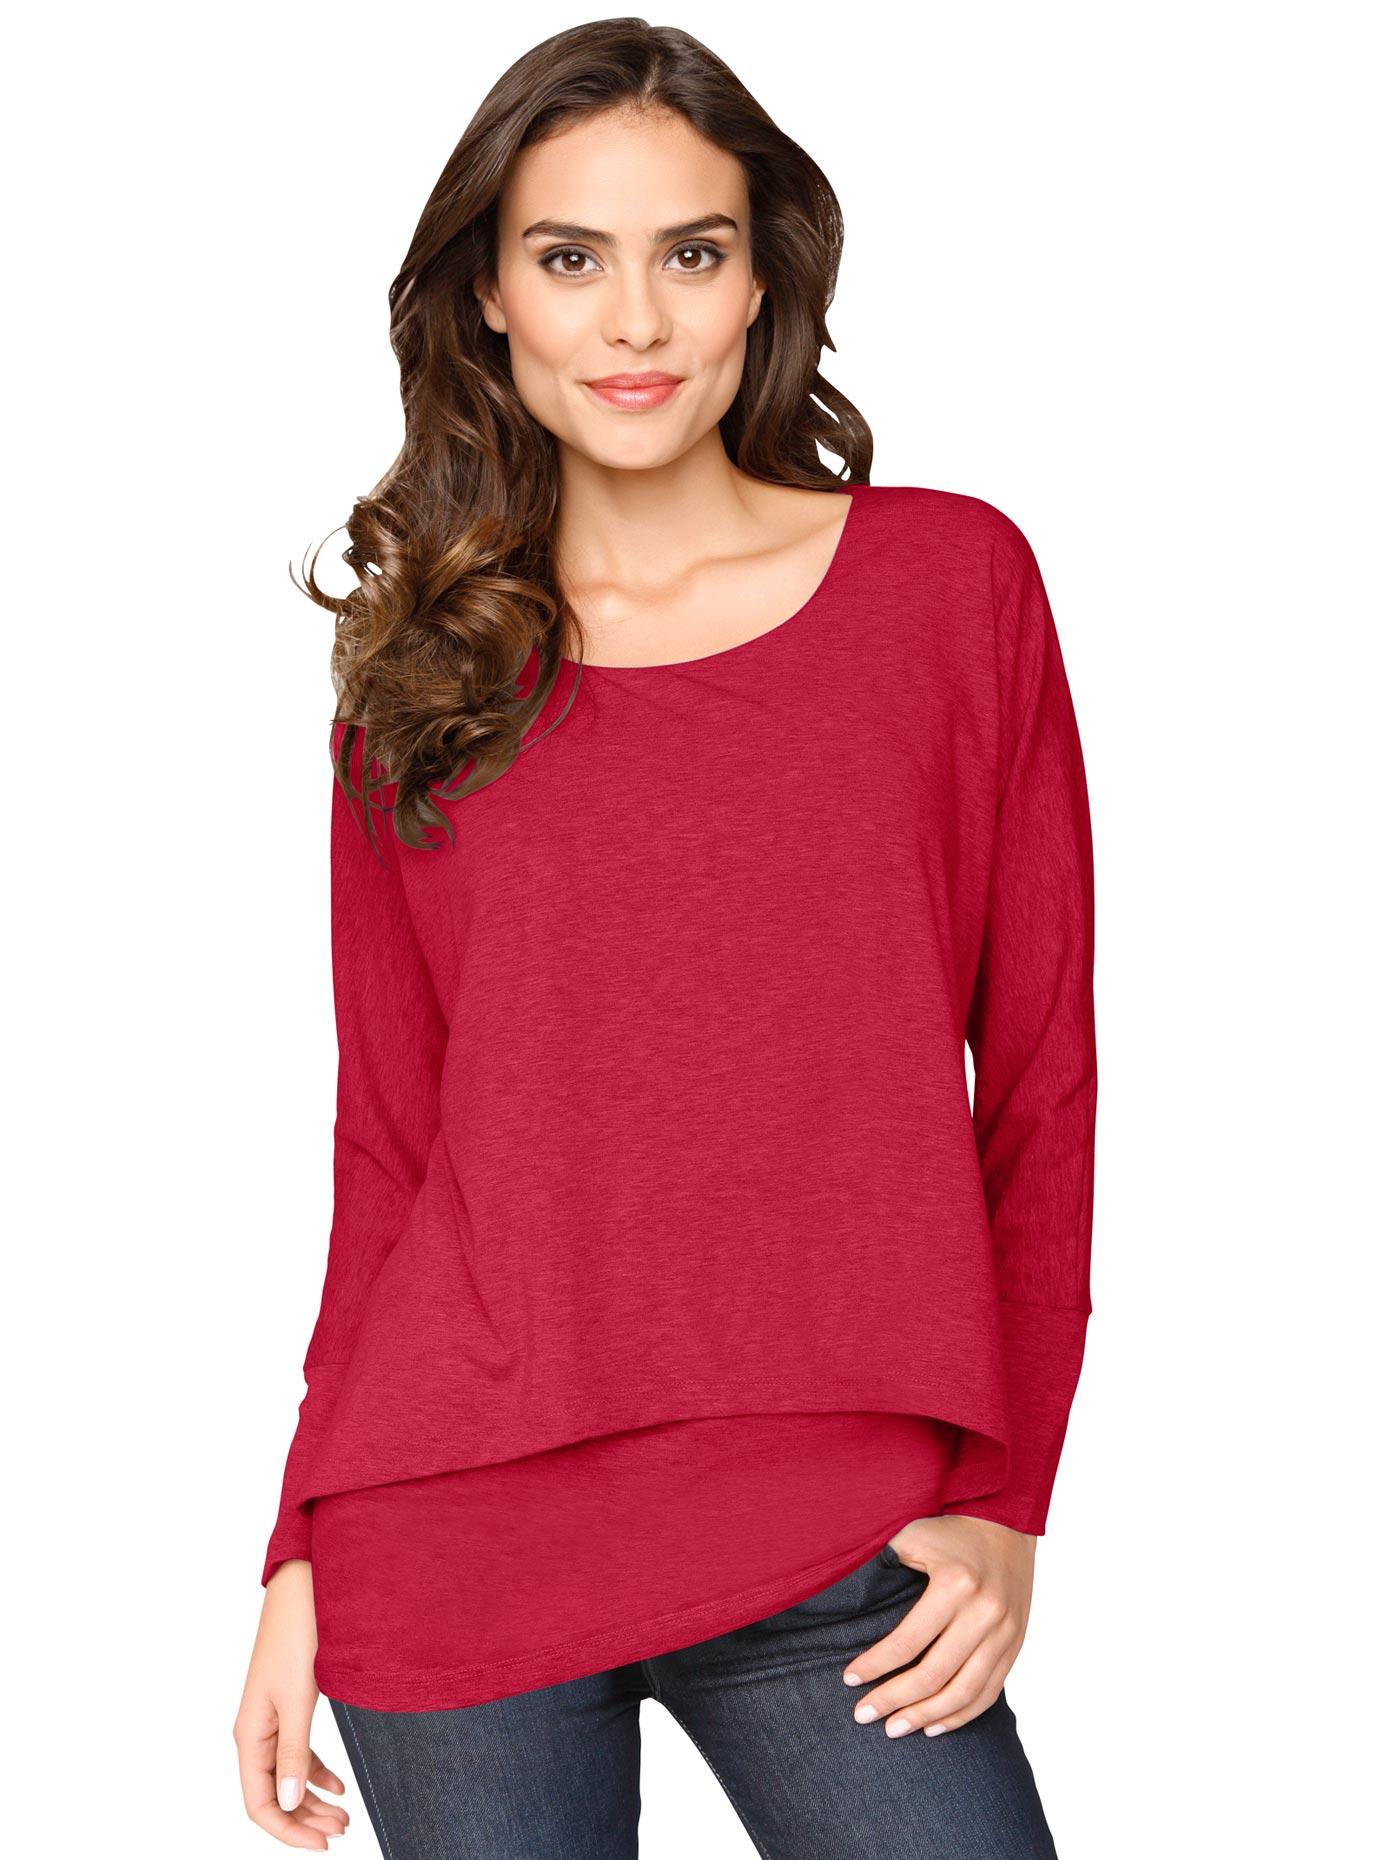 Ambria Longshirt im Lagen-Look | Bekleidung > Shirts > Longshirts | Rot | Ambria